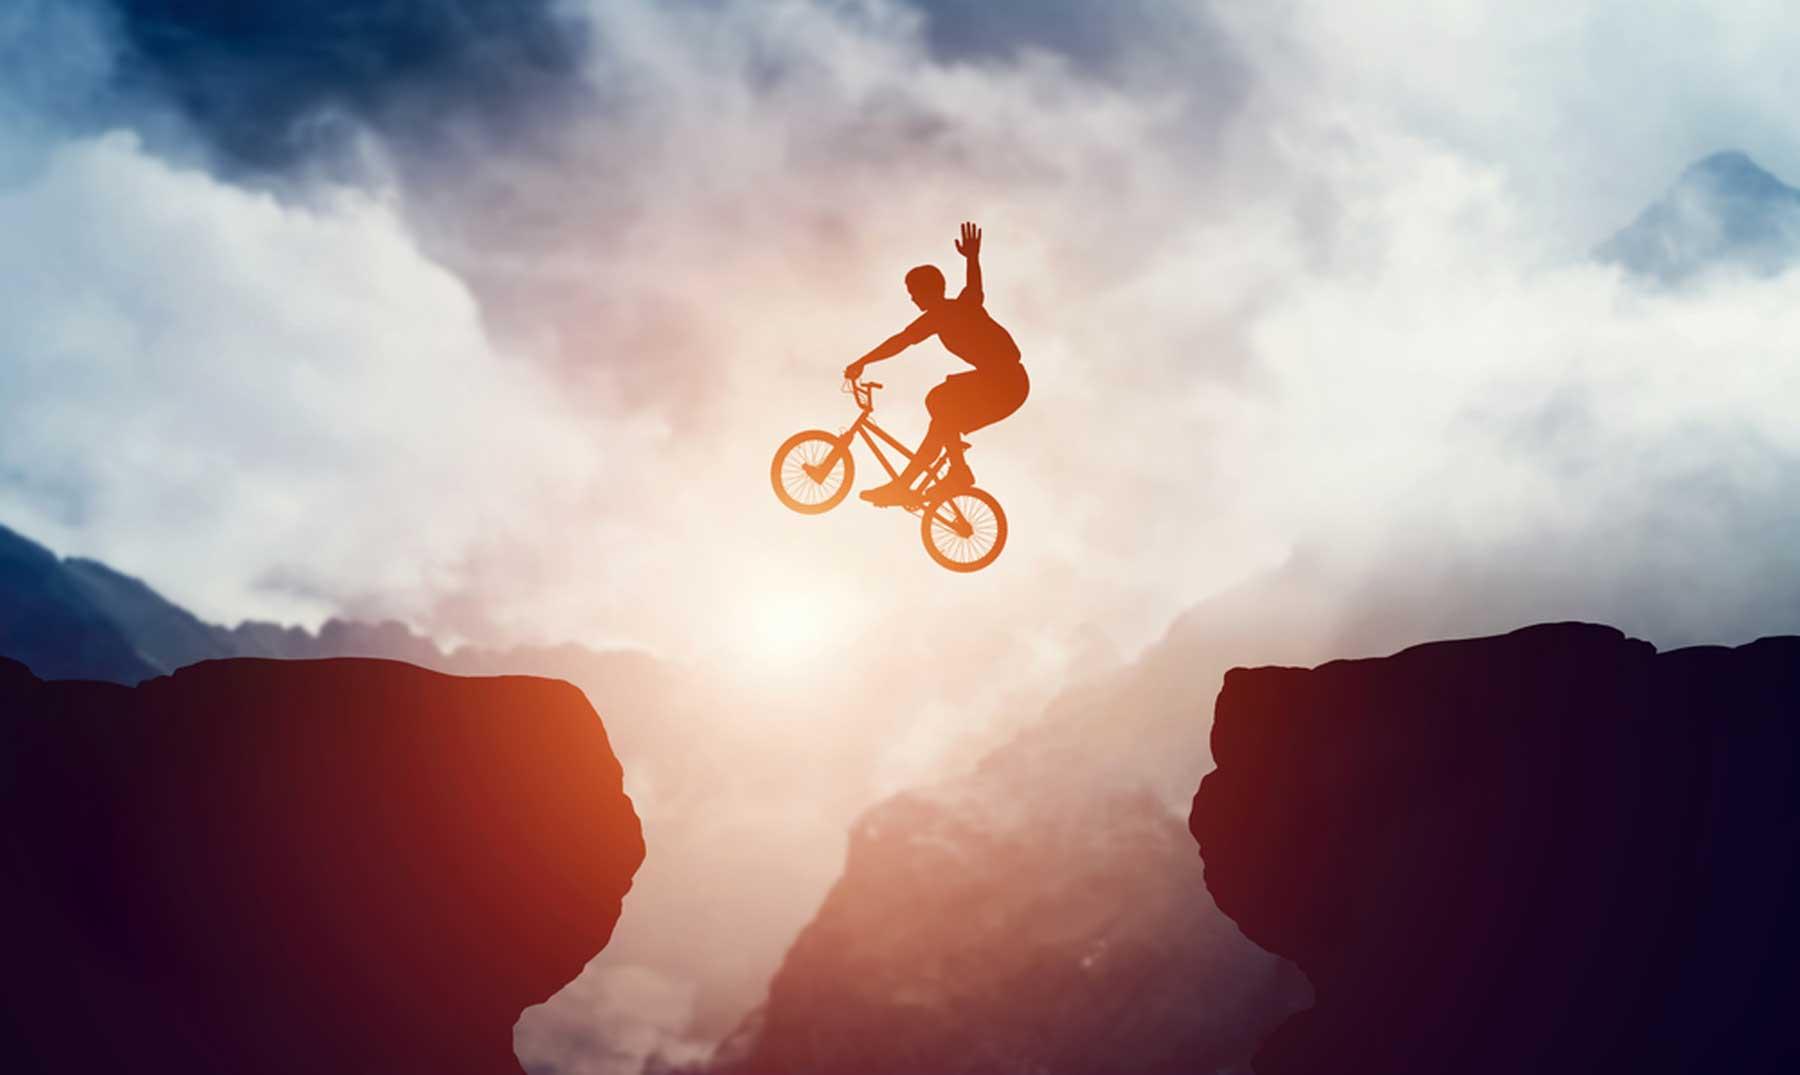 30 Frases De Adrenalina Un éxtasis Del Ritmo De La Vida